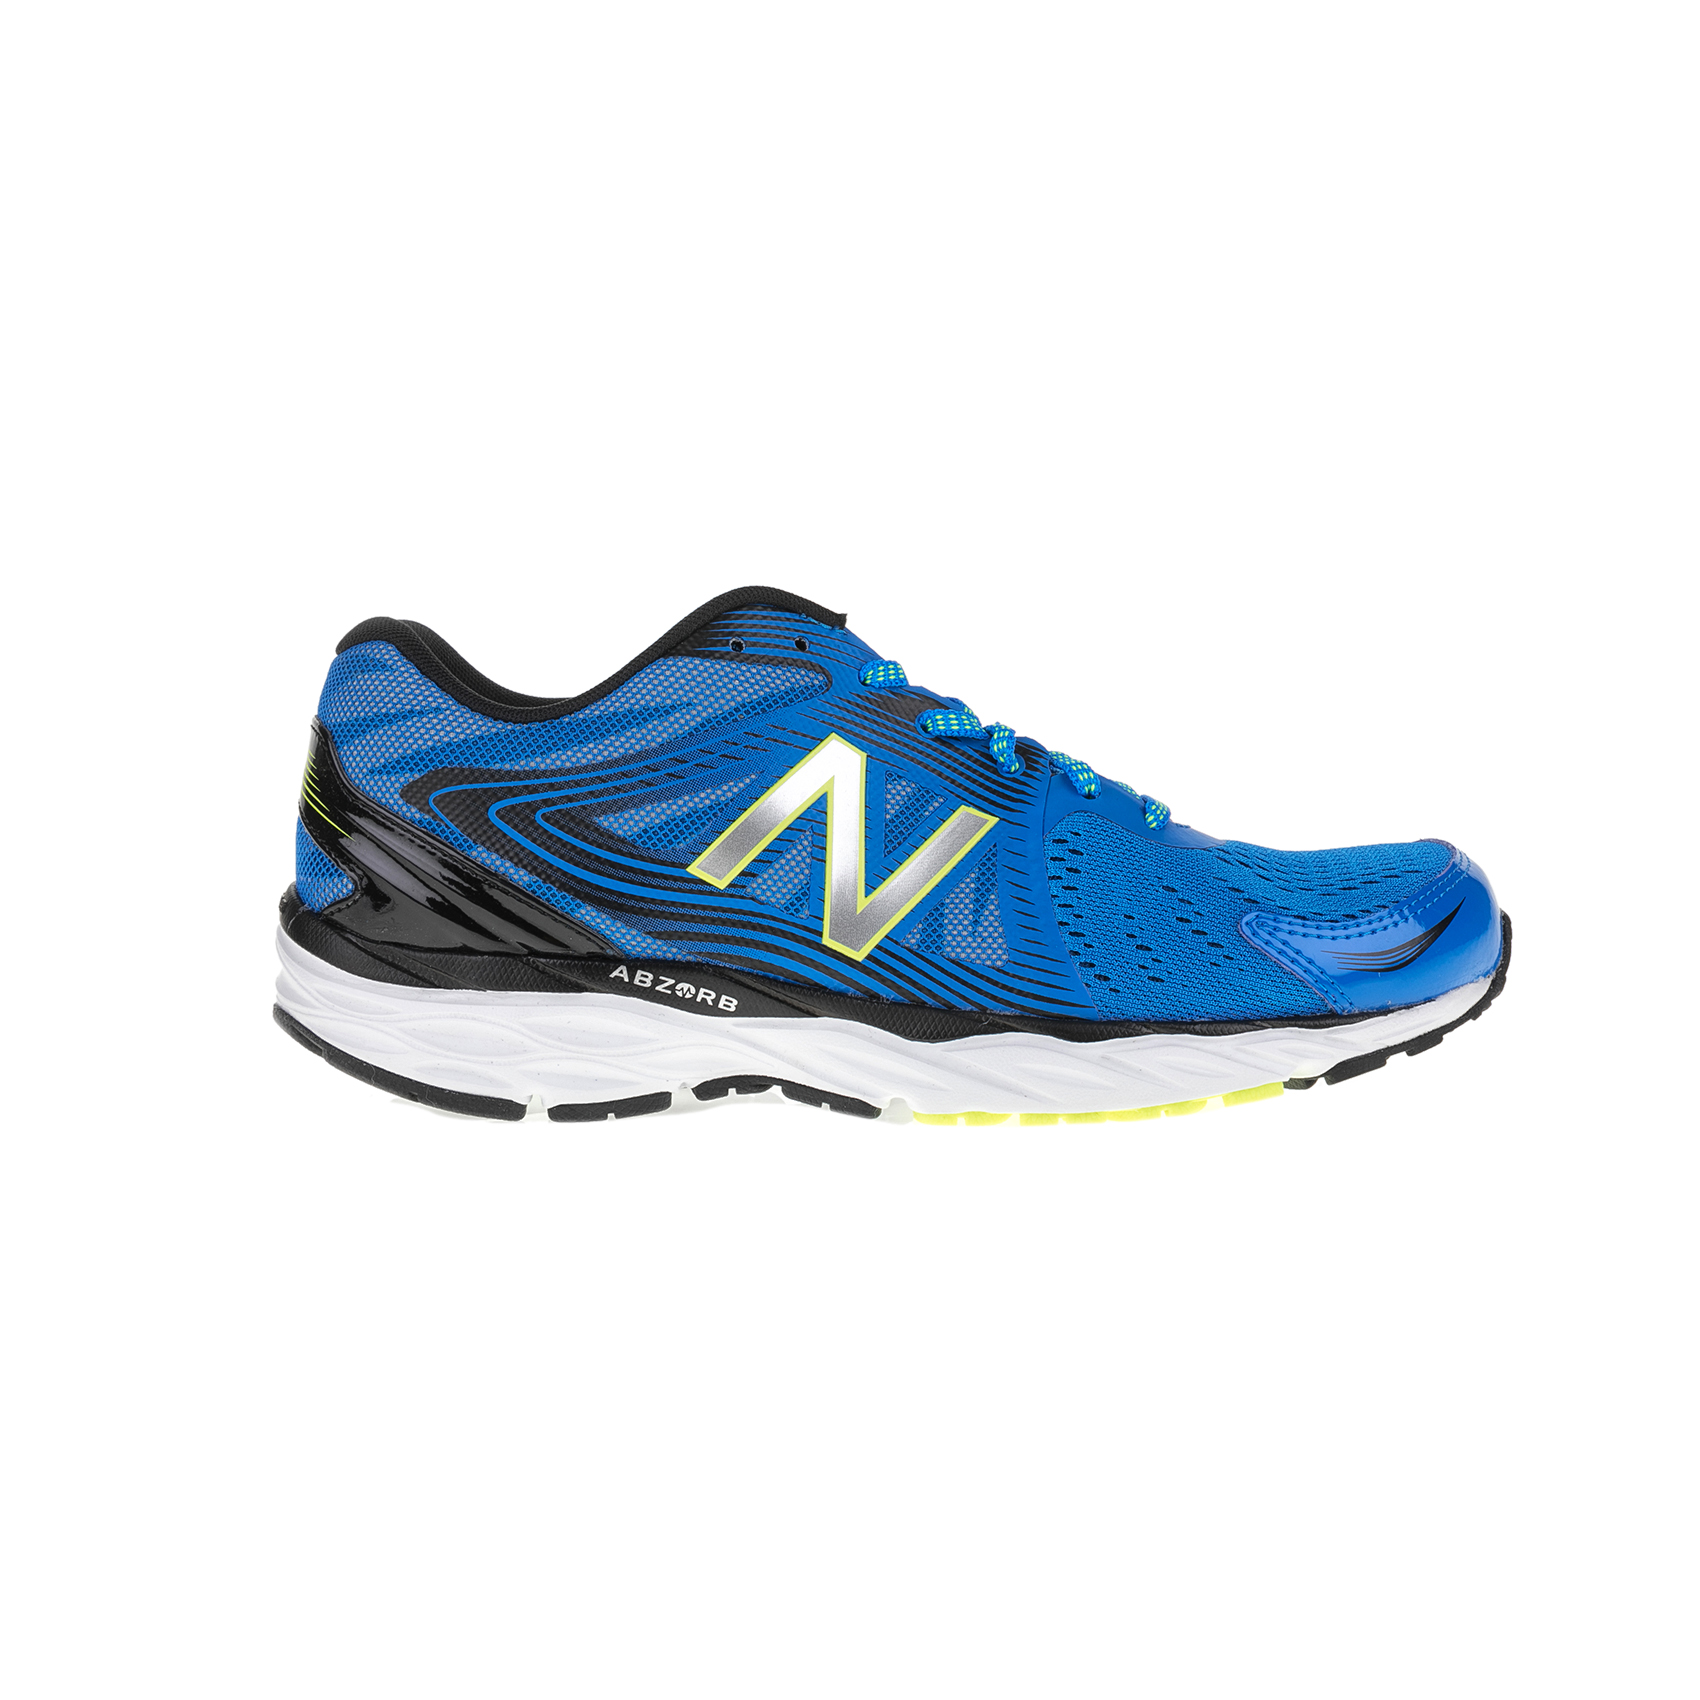 NEW BALANCE – Ανδρικά παπούτσια NEW BALANCE M680LE4 μπλε